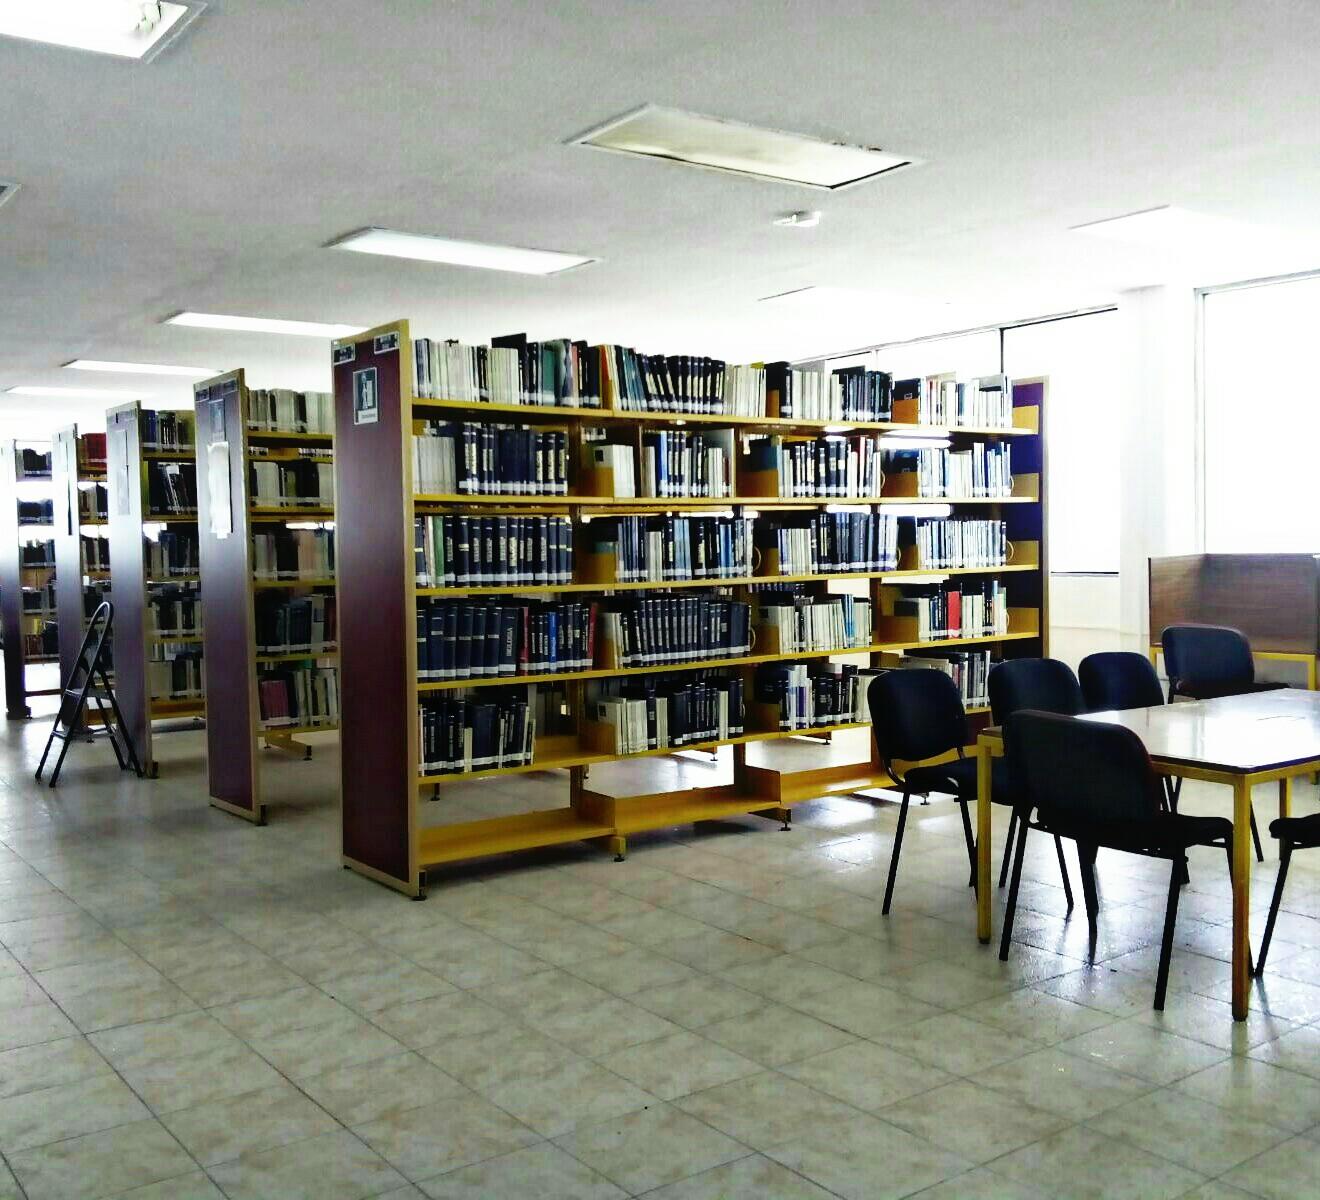 Biblioteca de la prepa Alfonso Calderón de la BUAP foto de Mitzi Hernández